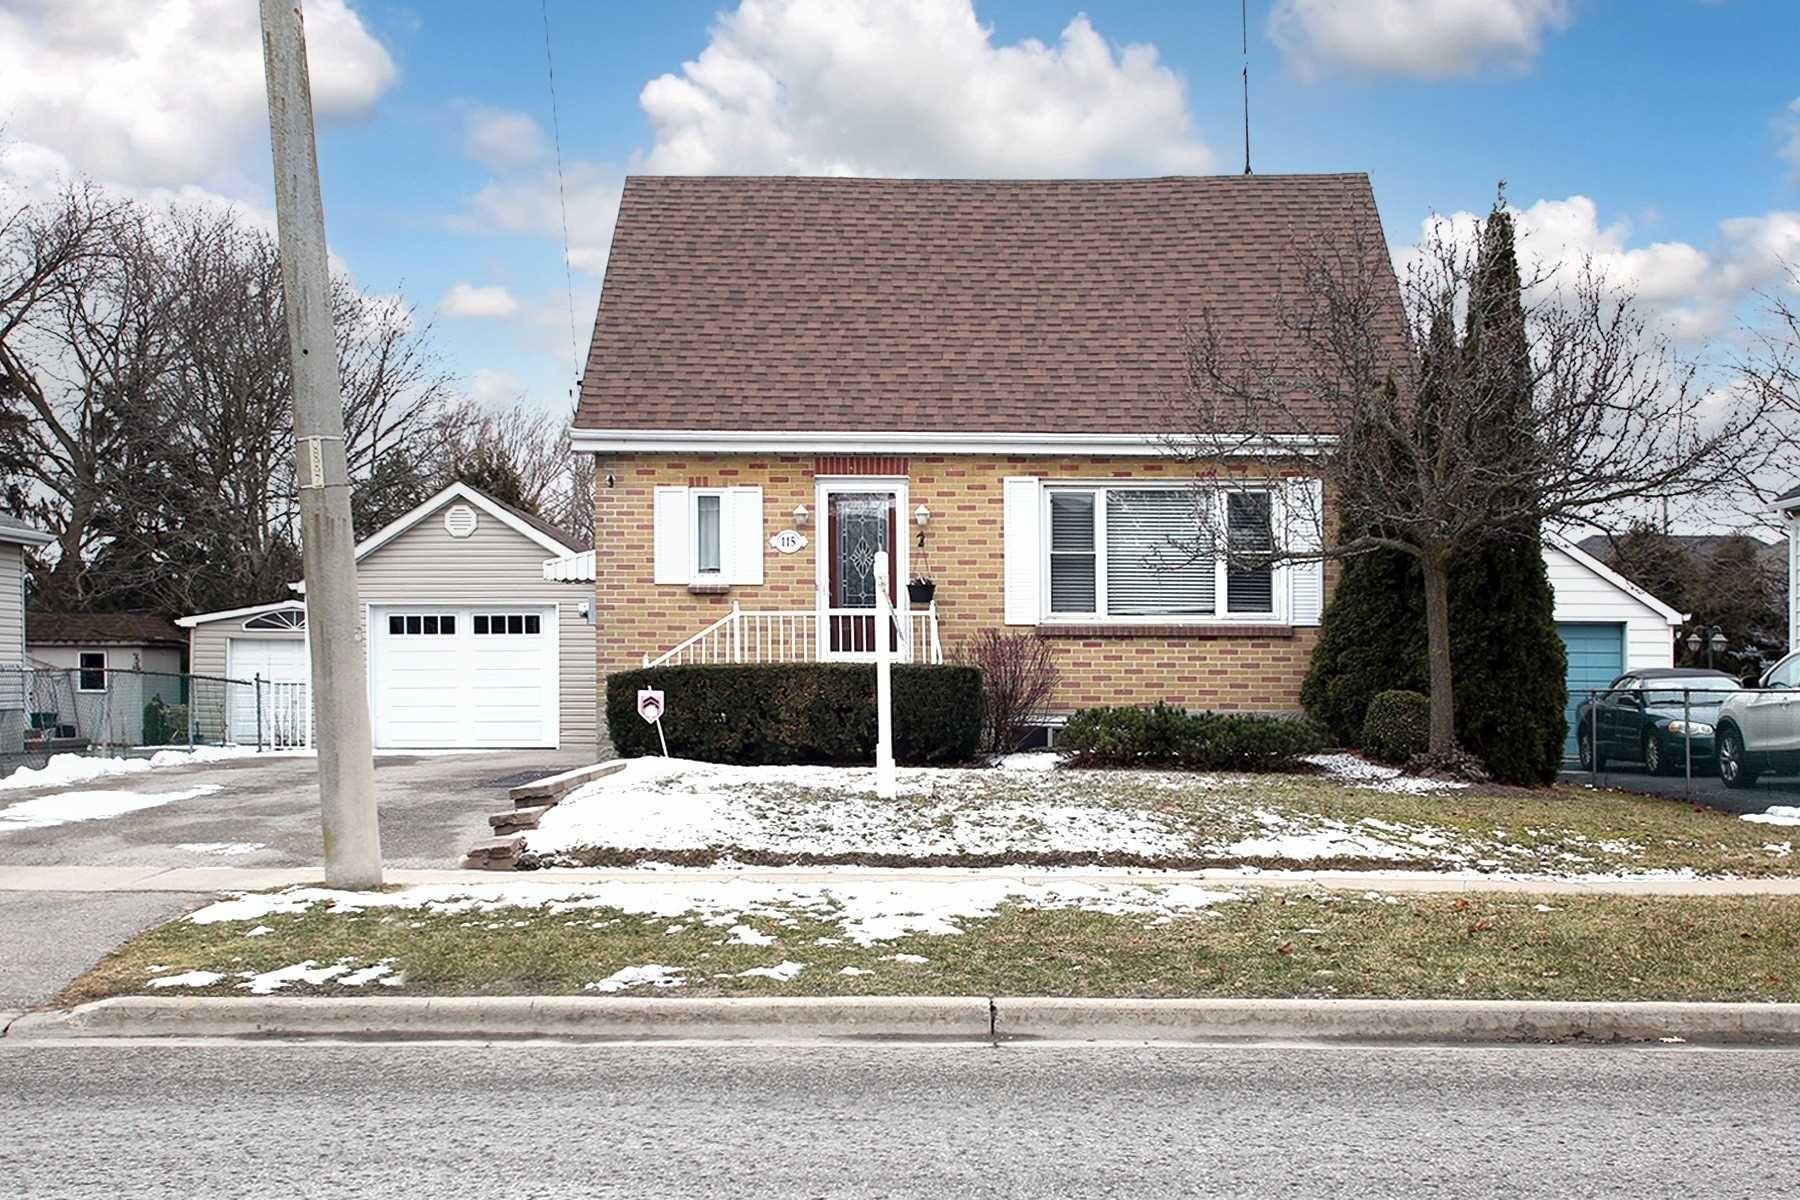 Main Photo: Upper 115 W Beatrice Street in Oshawa: Centennial House (1 1/2 Storey) for lease : MLS®# E5145346